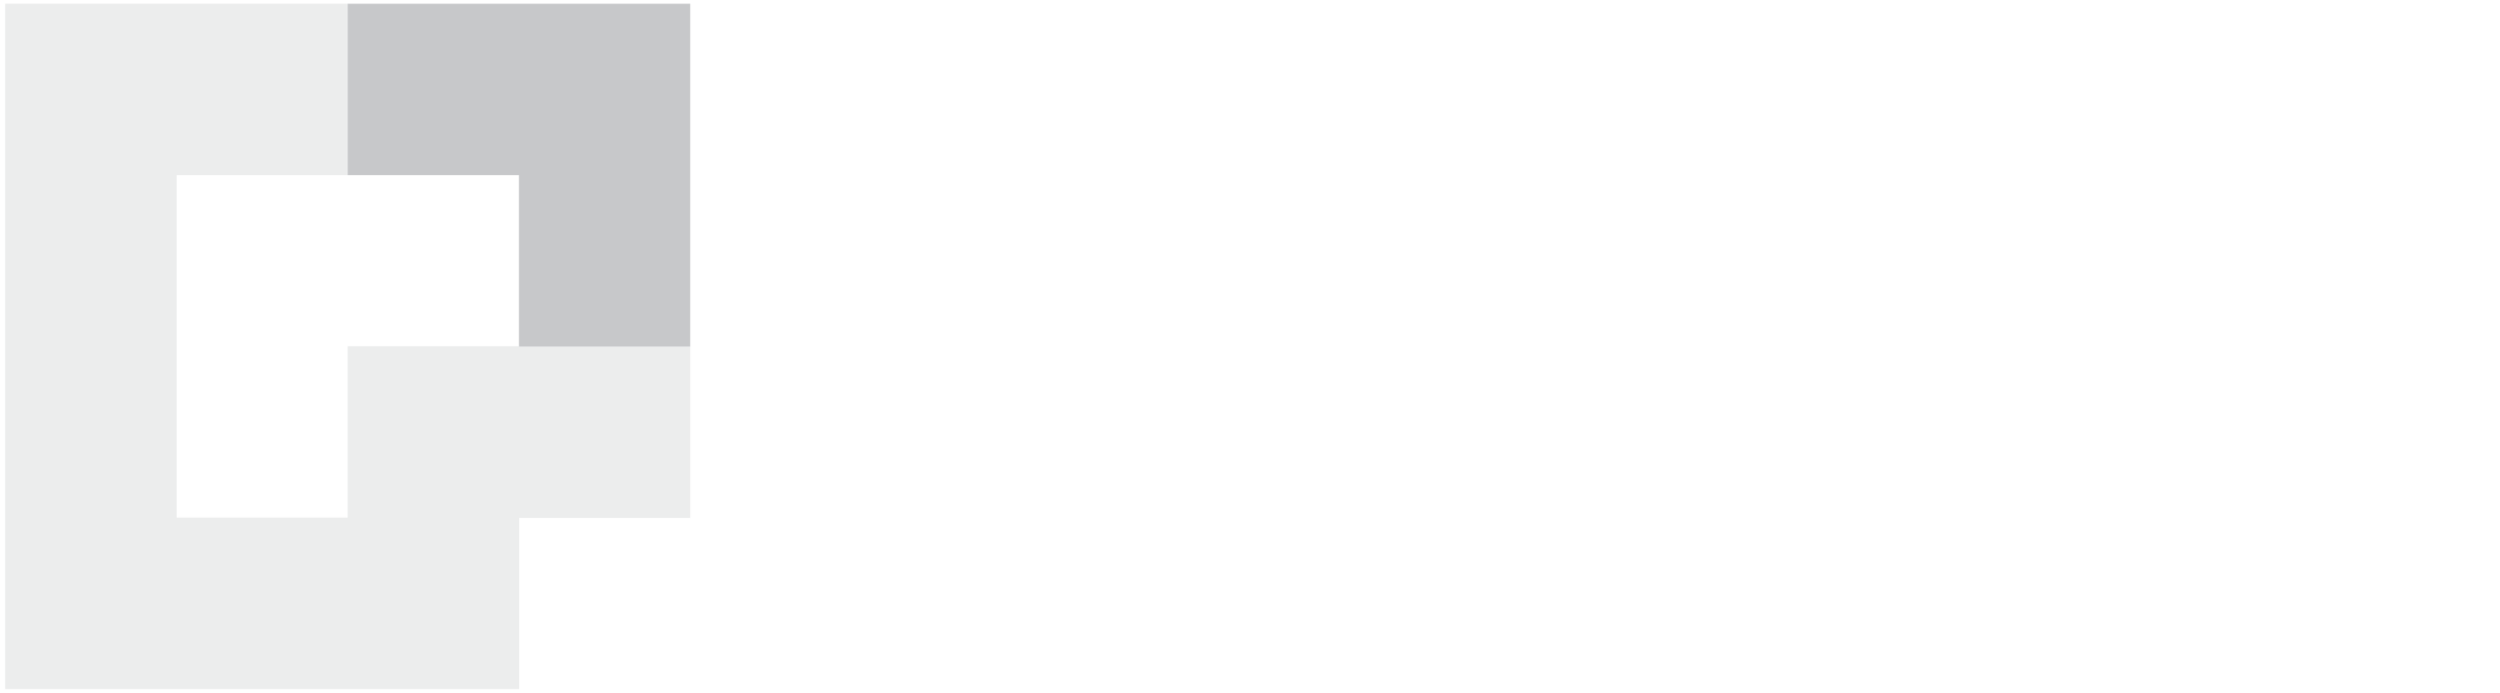 logo-portafolio-inmobiliario-para-fondos-oscuros.png